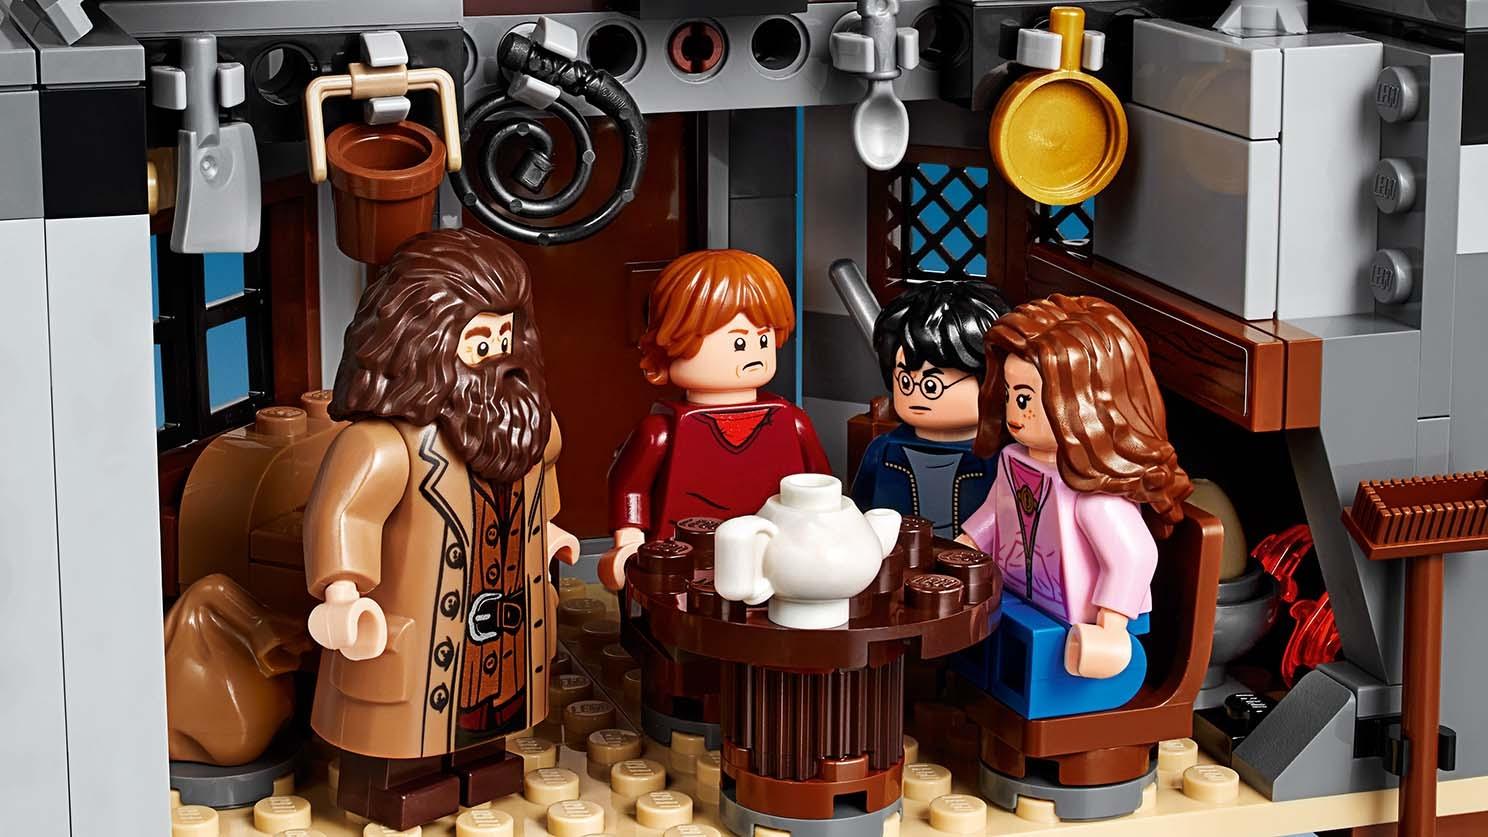 Lego BuckBeakC02 From set 75947 Harry Potter